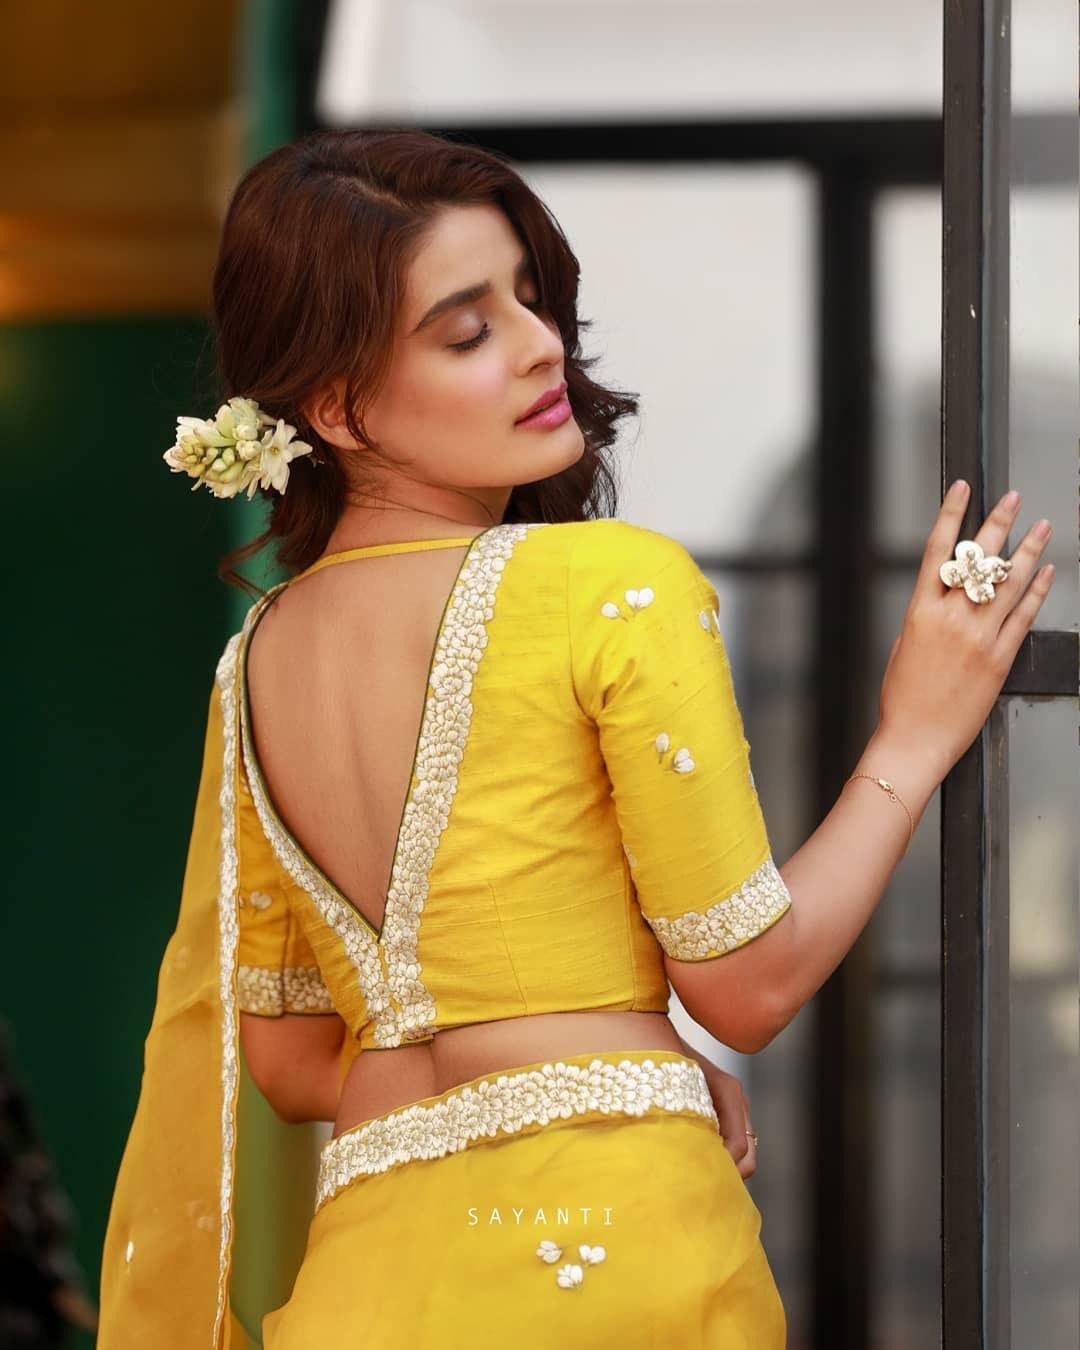 jasmine yellow blouse-Sayanti Ghosh-1